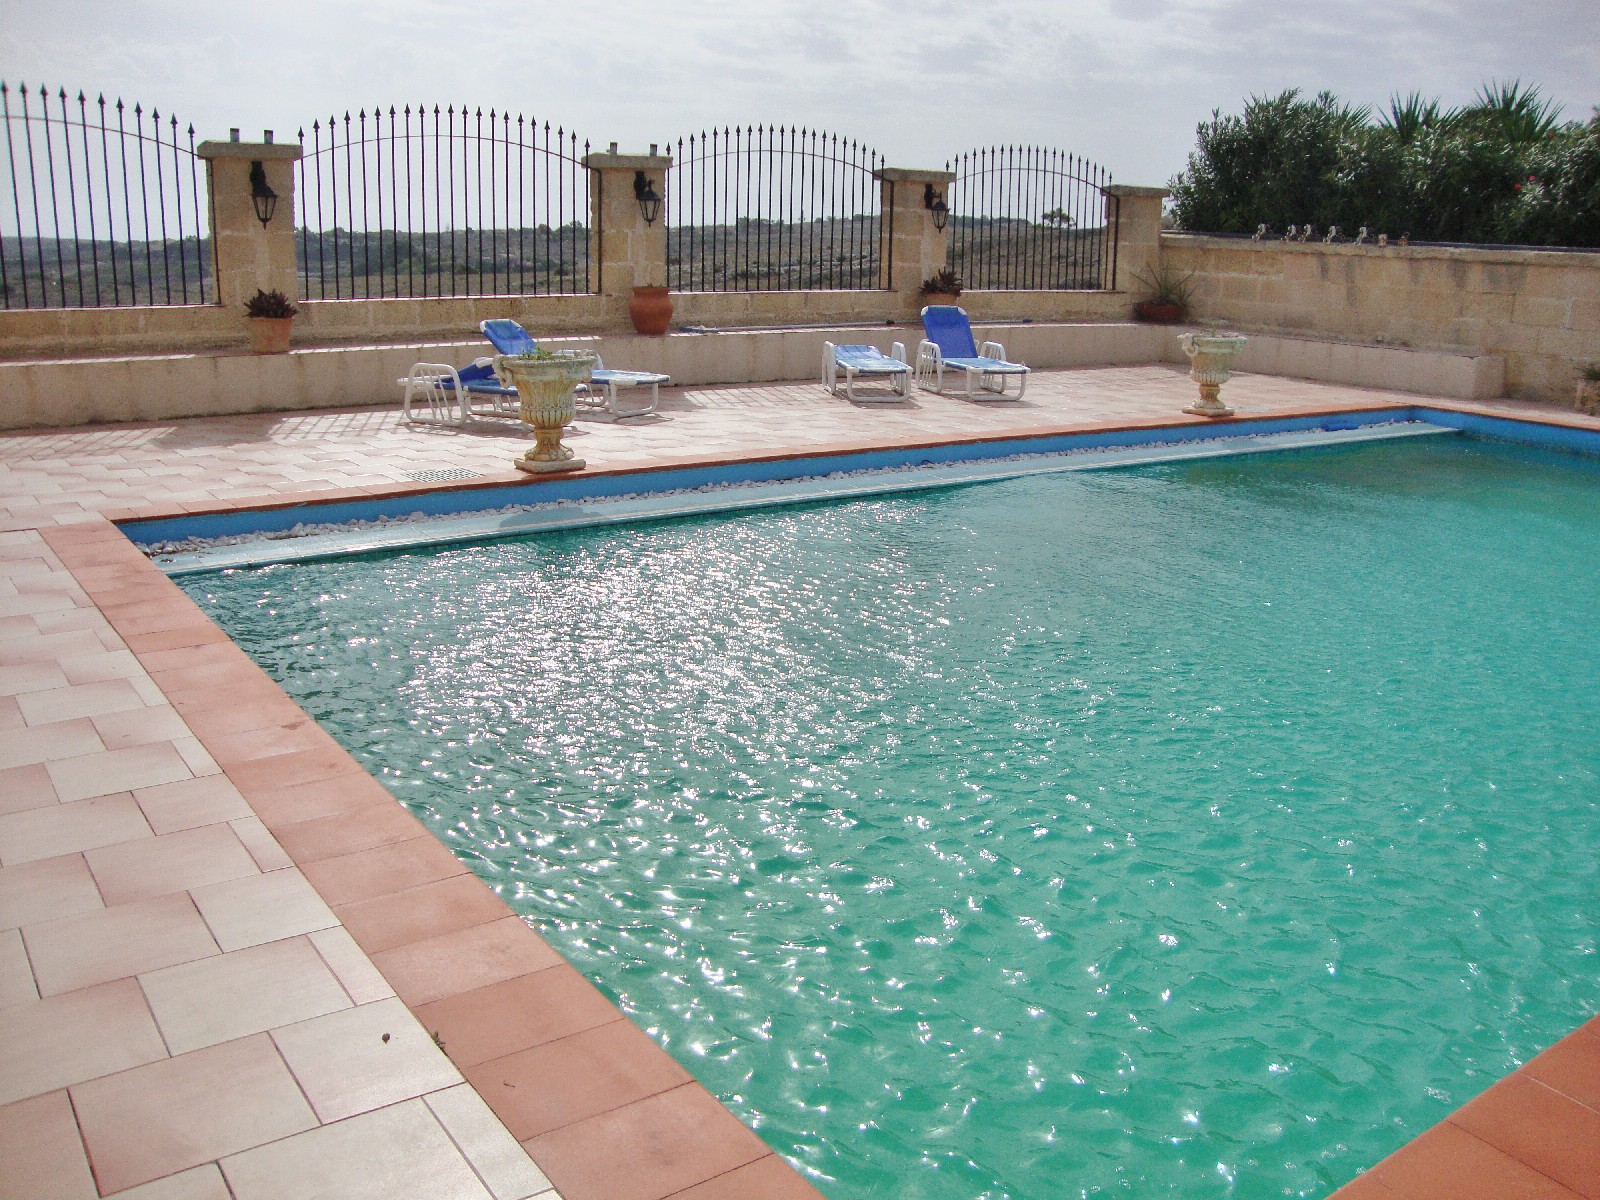 Malta Property for sale in Malta, Rabat